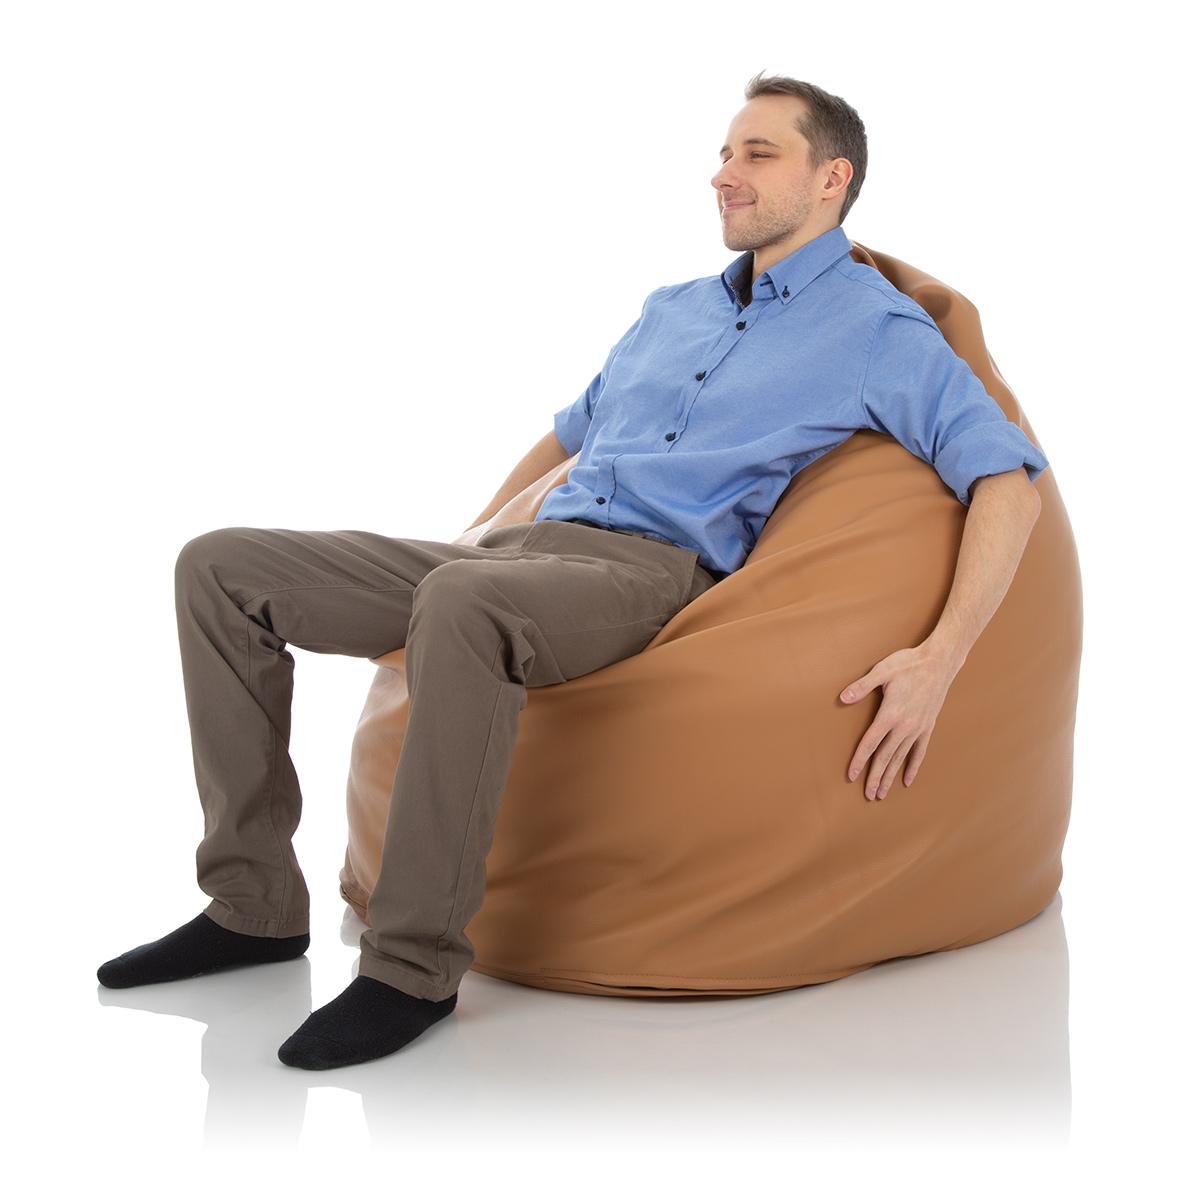 XXL Sitzsack Relax aus Leder Karamell Braun